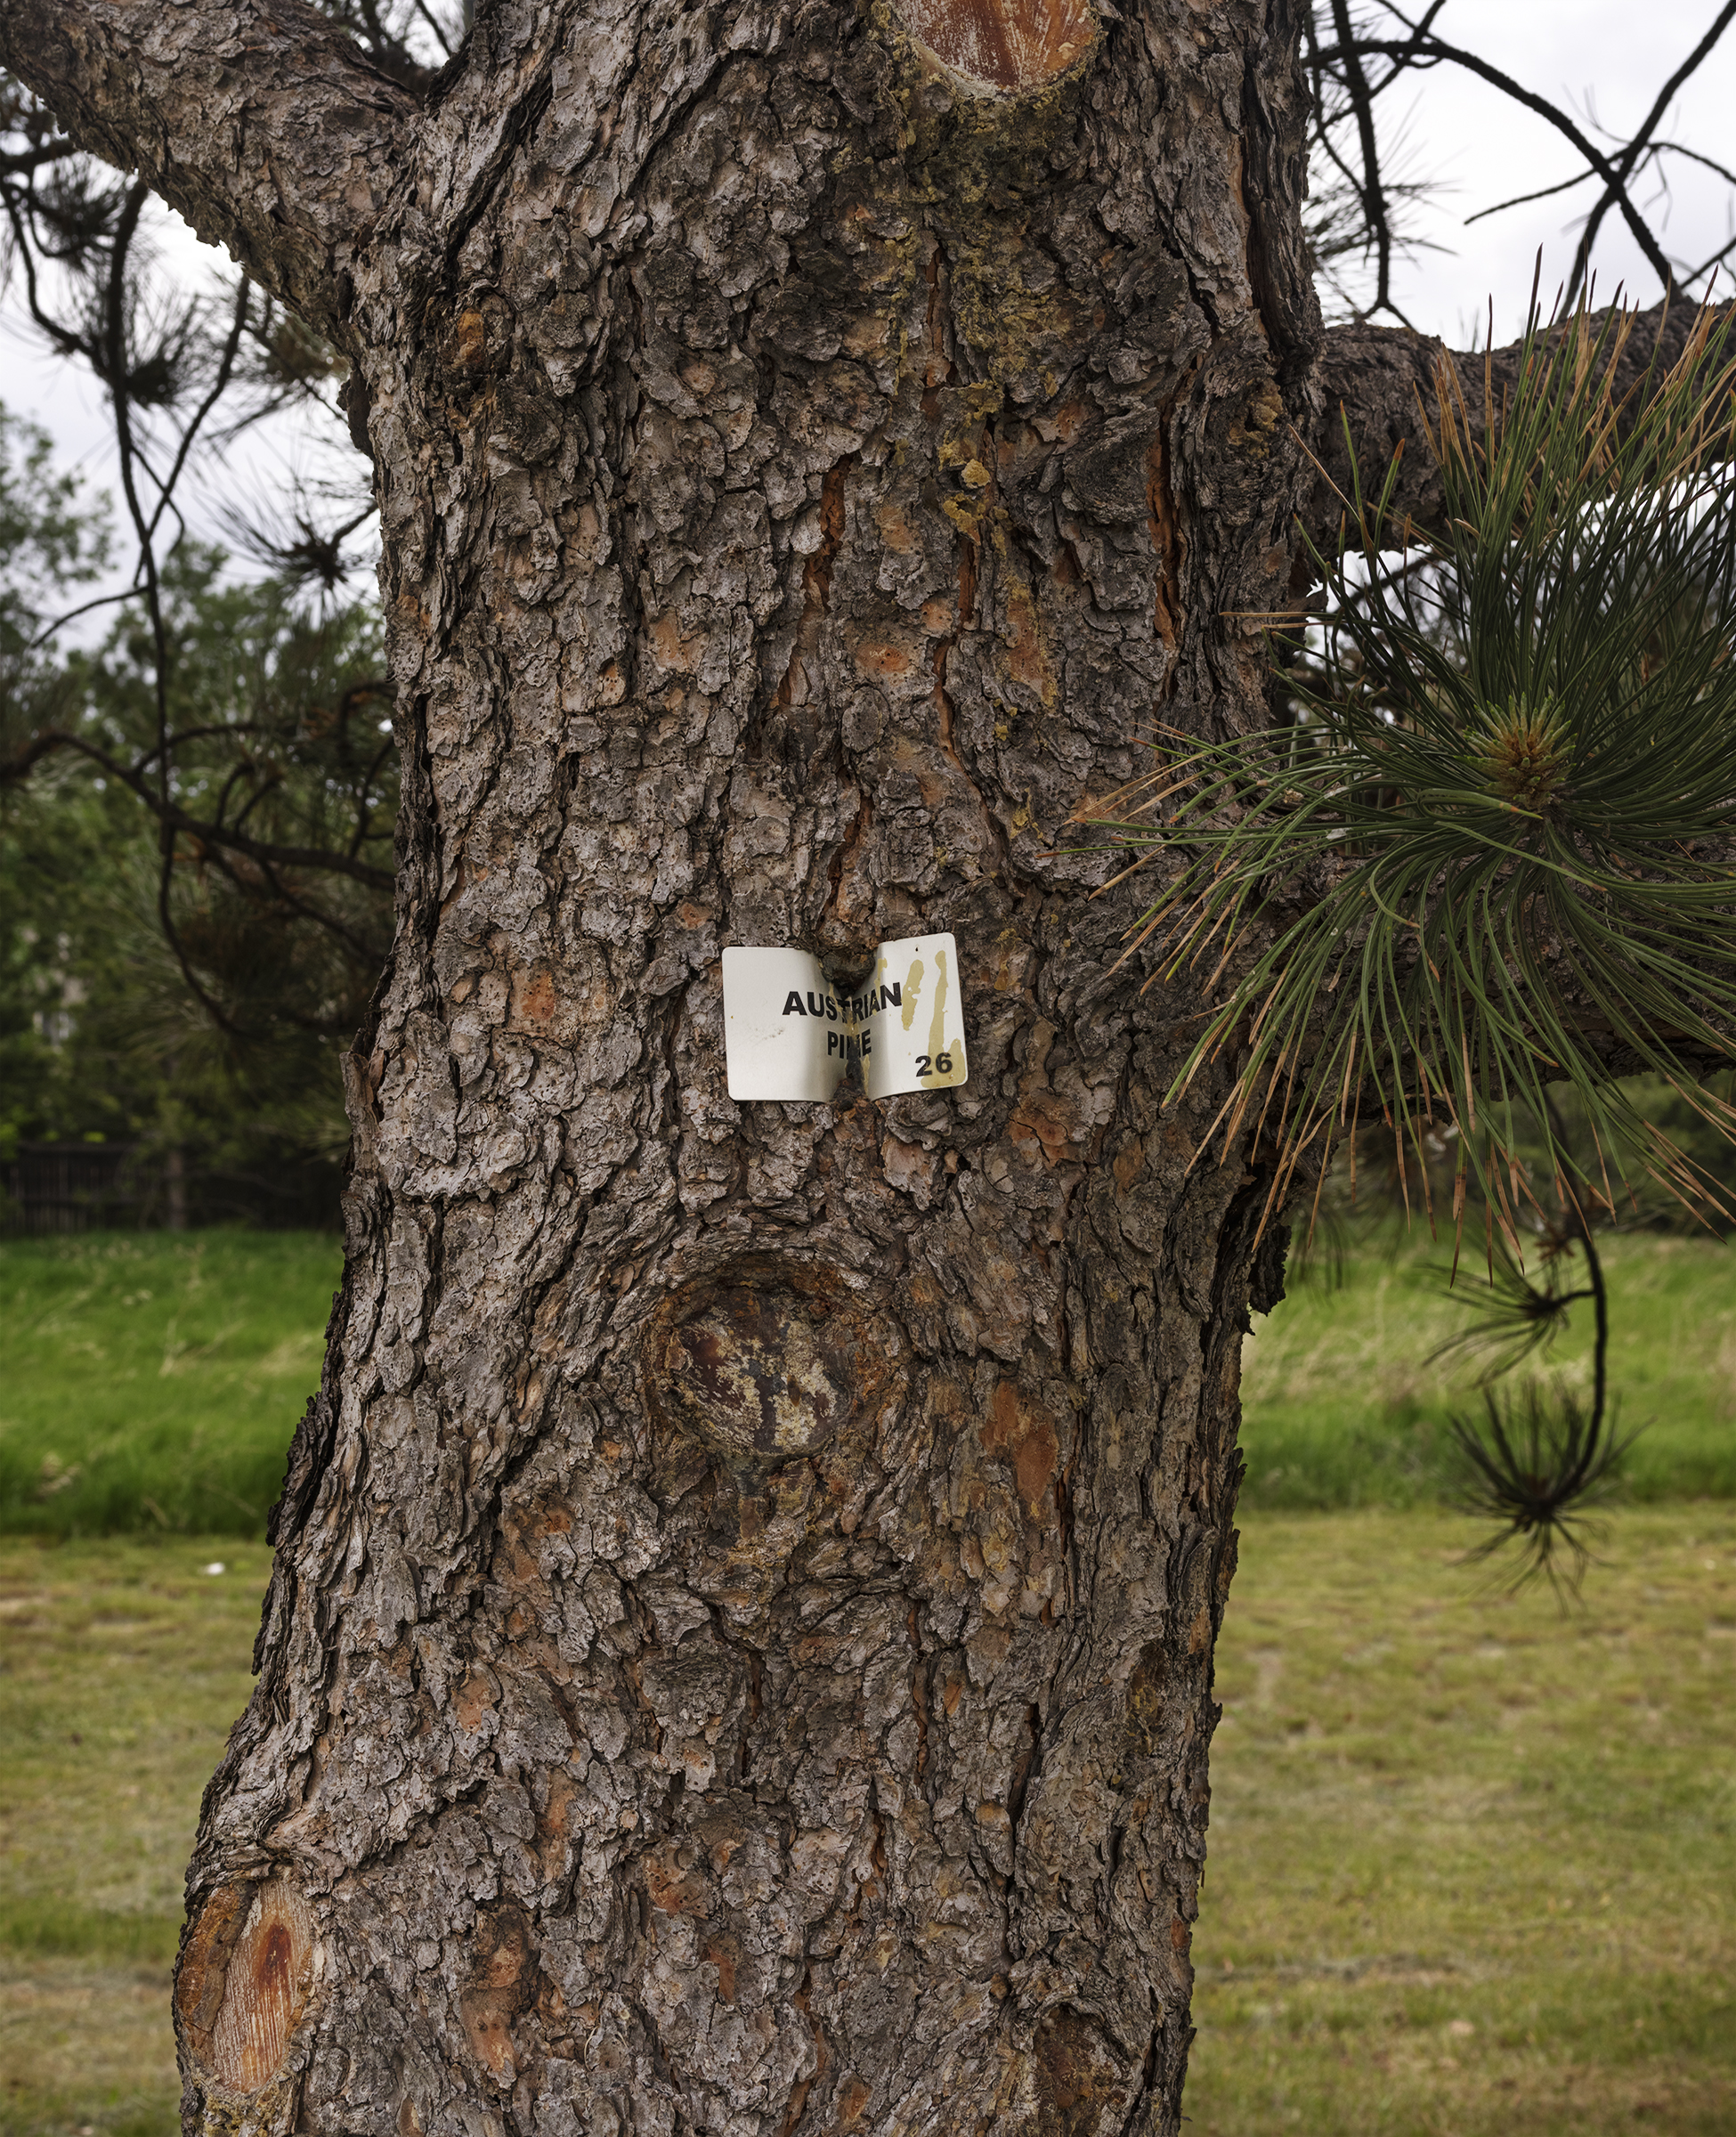 Austrian Pine #26